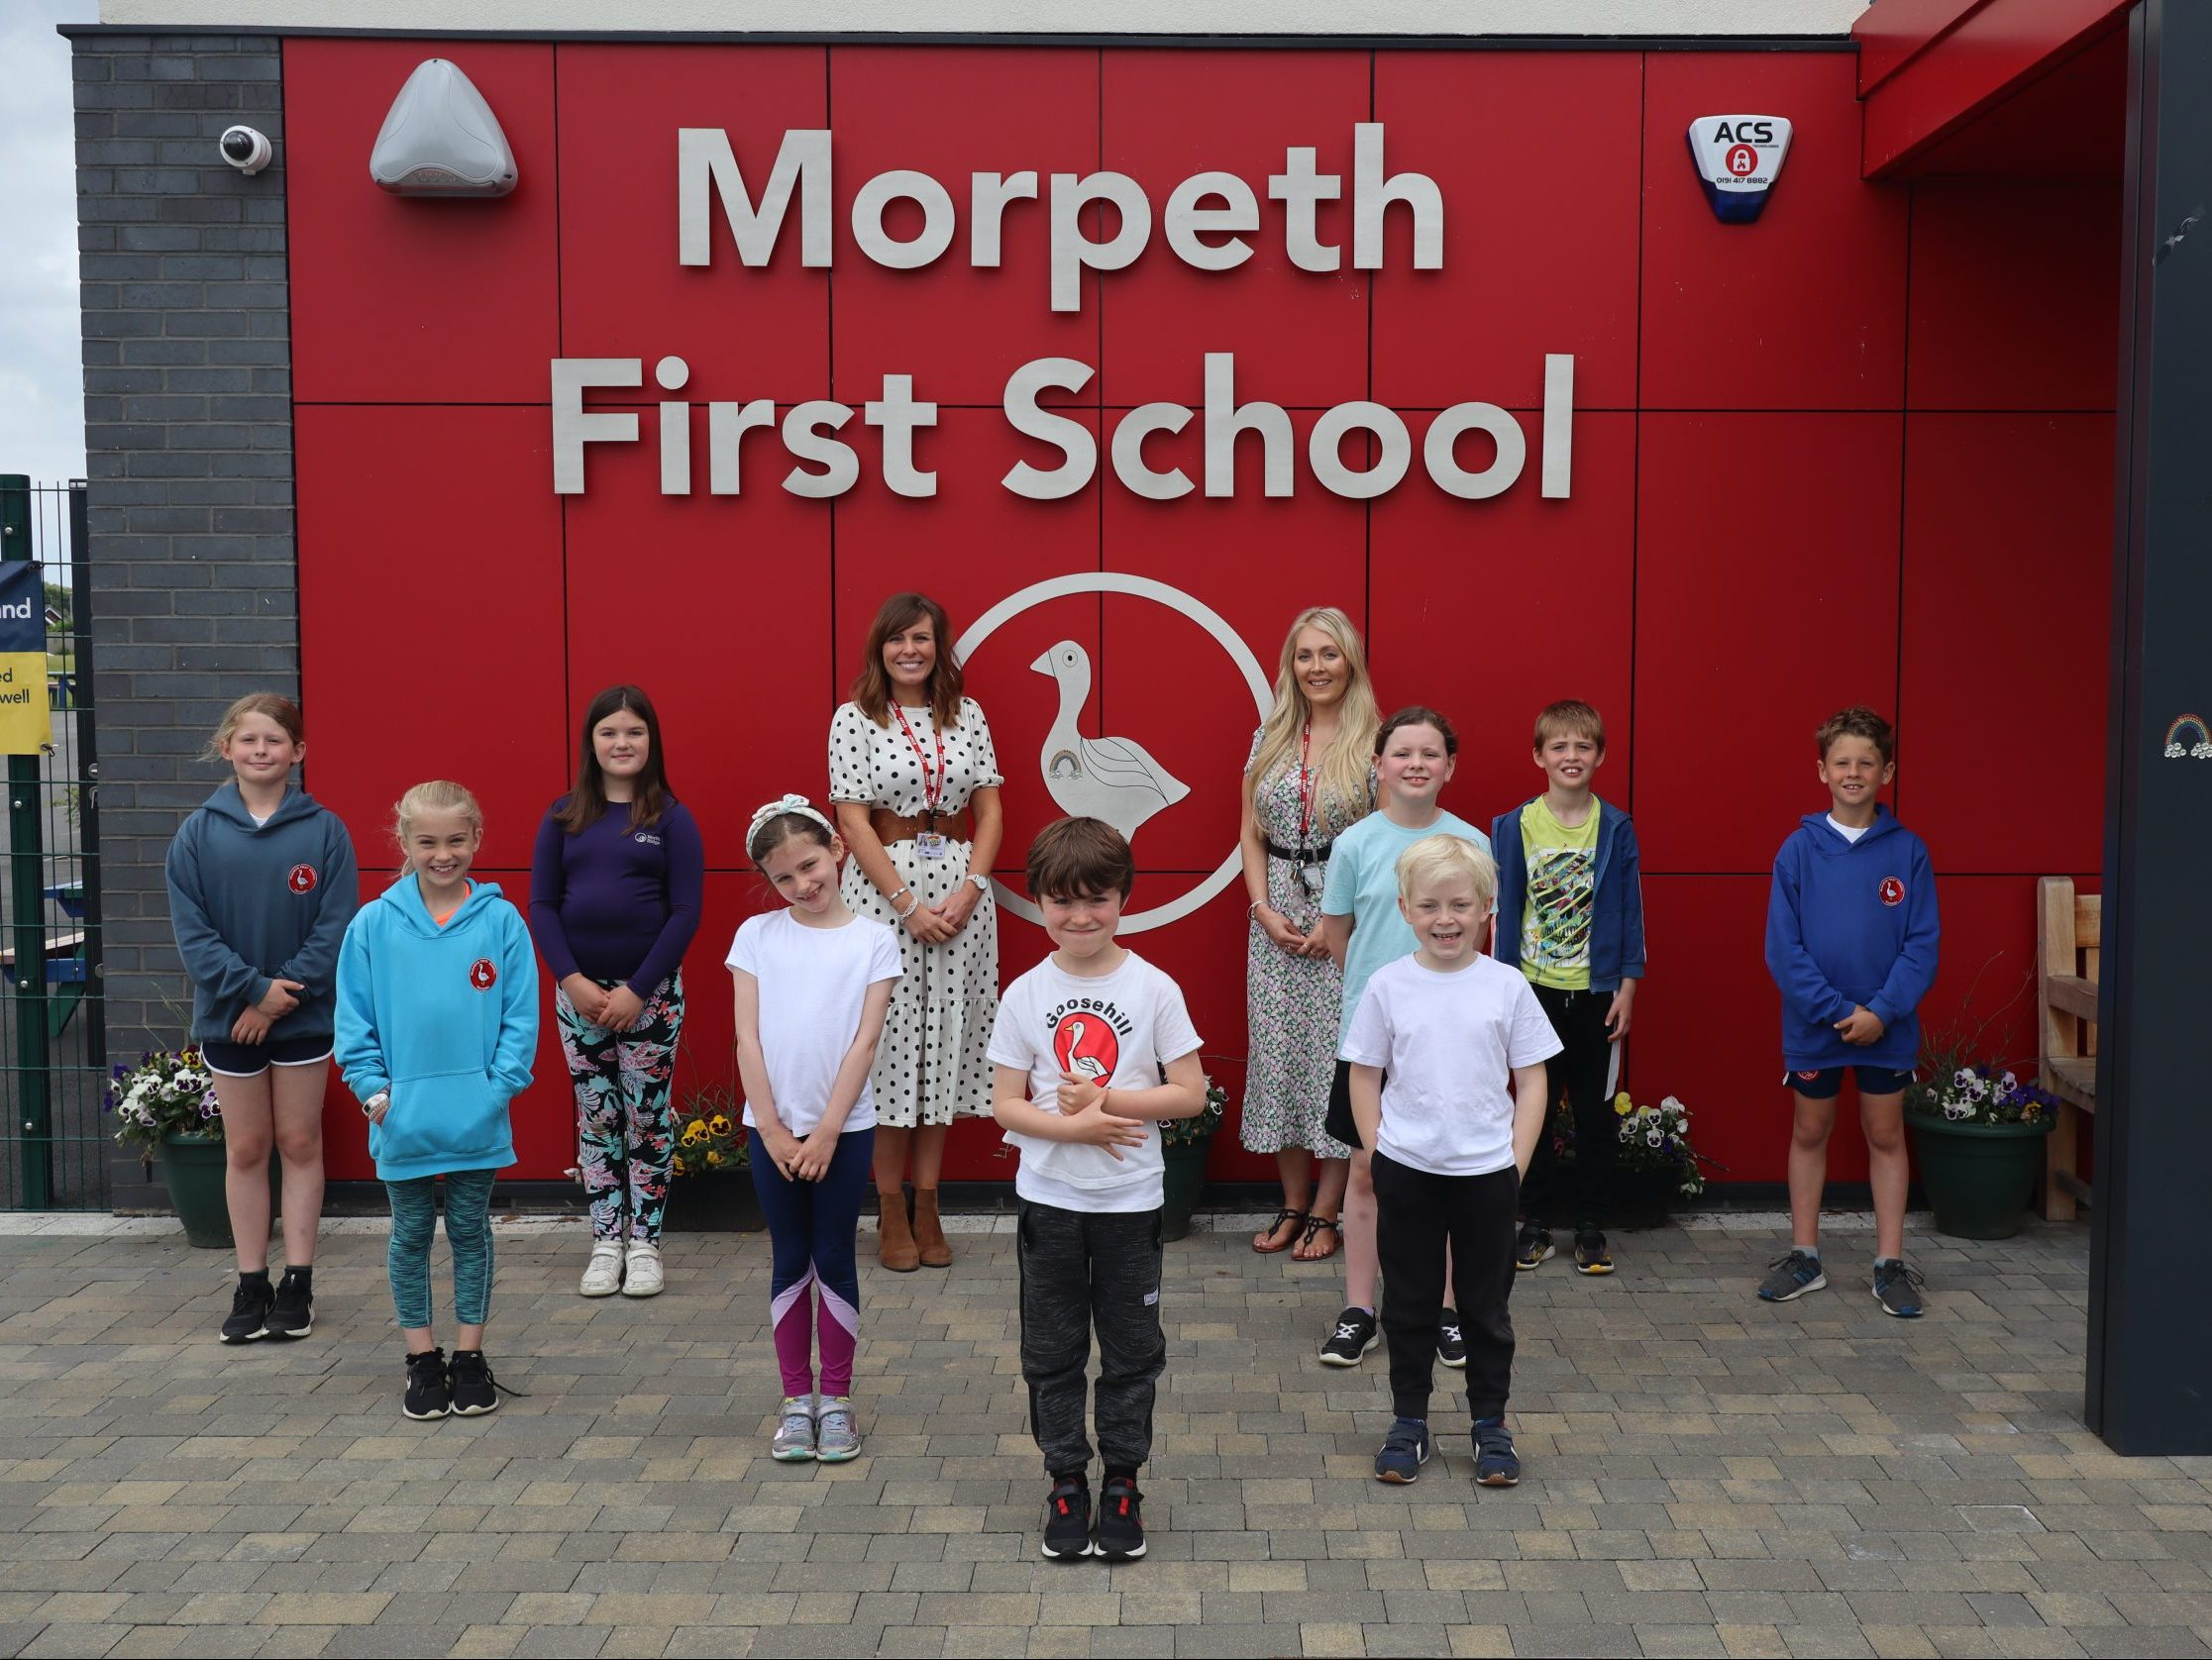 Morpeth First School